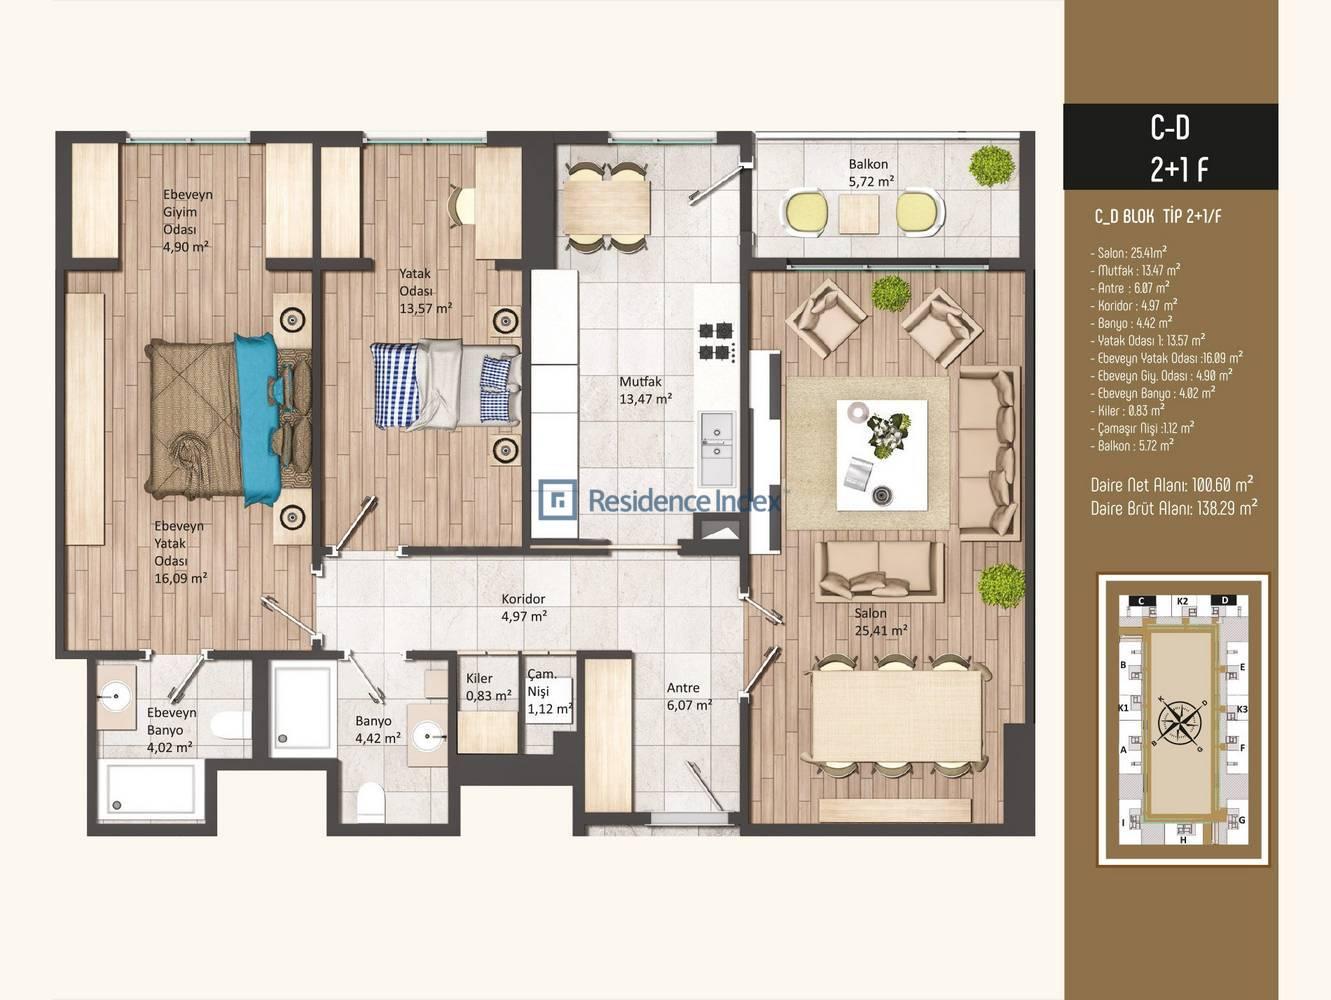 Kameroğlu Metrohome Residence 2+1 F